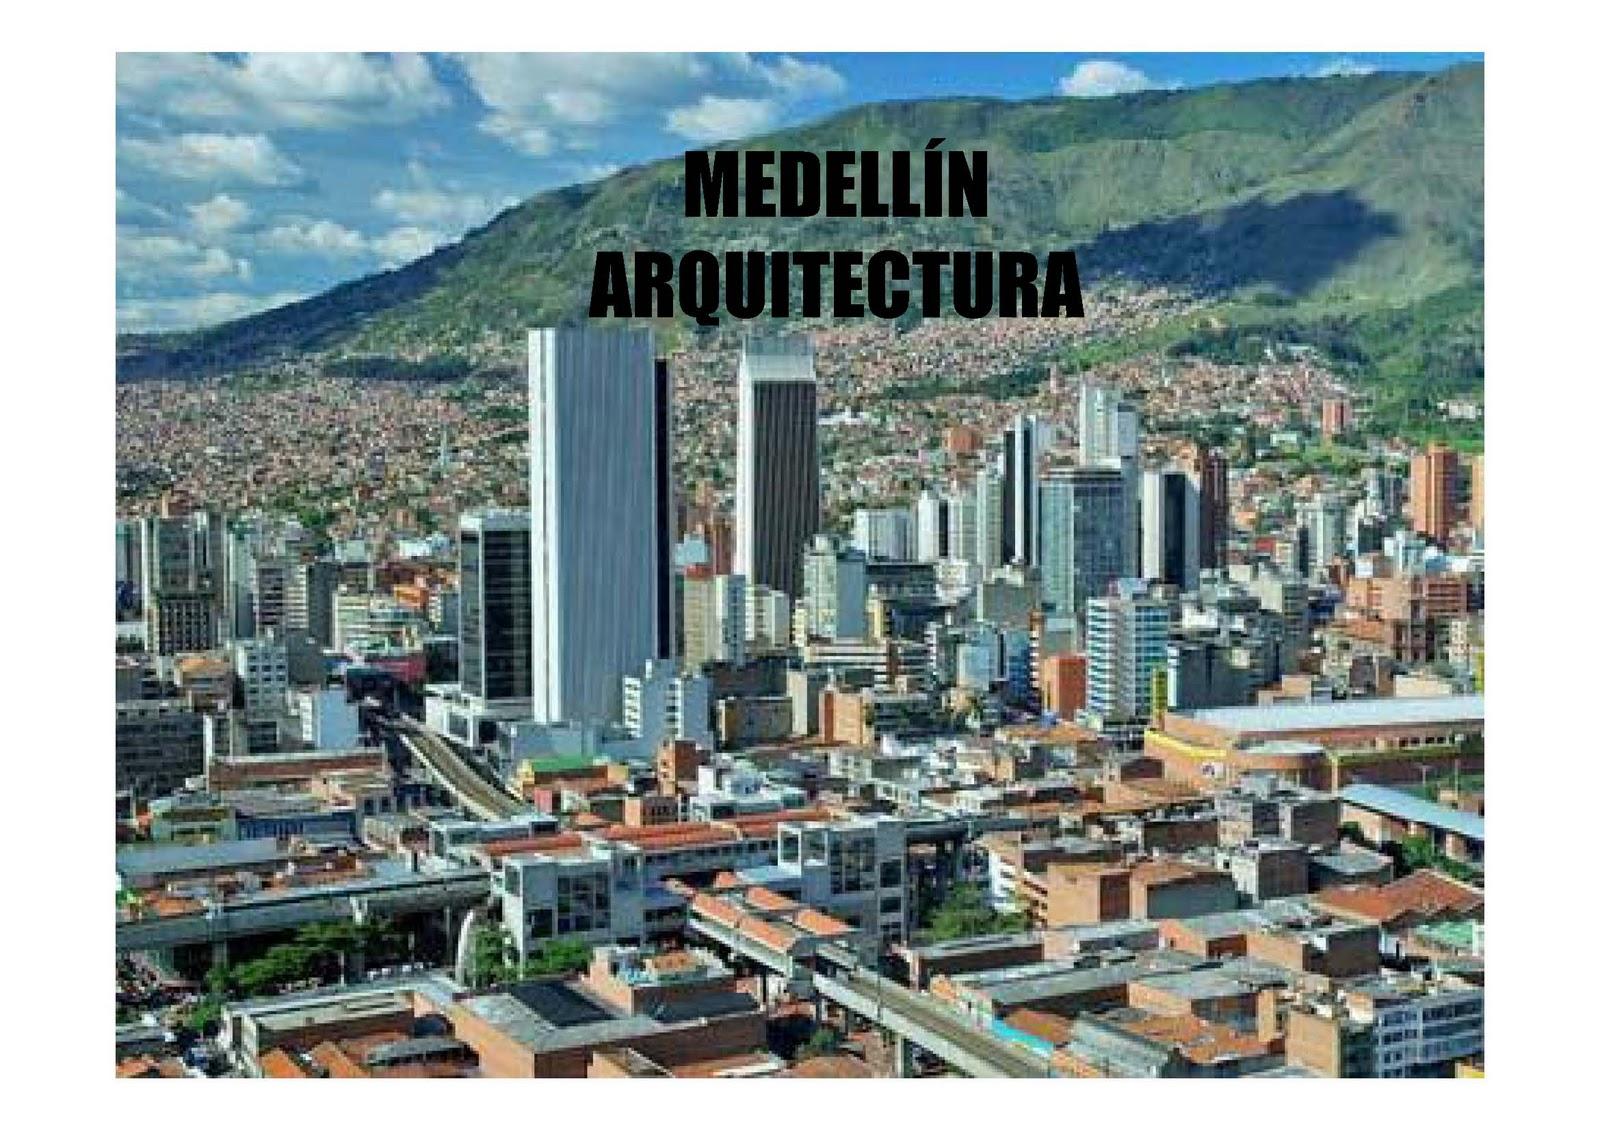 Tesis de arquitectura ejemplos pdf for Tesis de arquitectura ejemplos